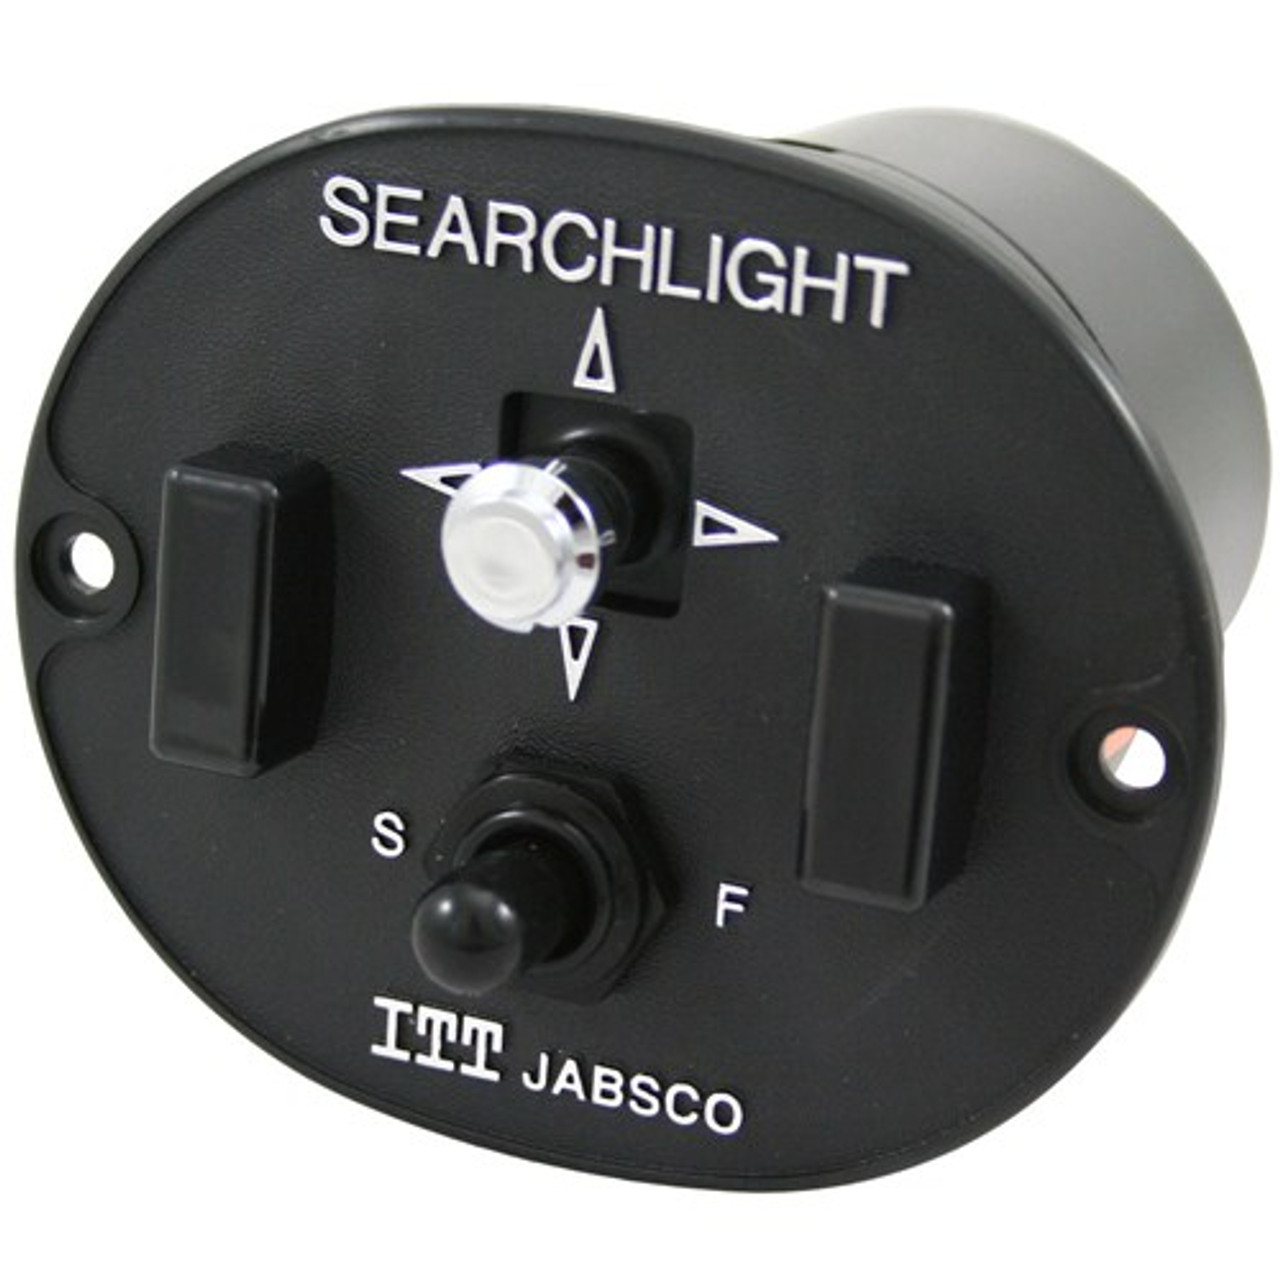 J65-132 Jabsco 60070-0000: Control Panel Searchlights 24V